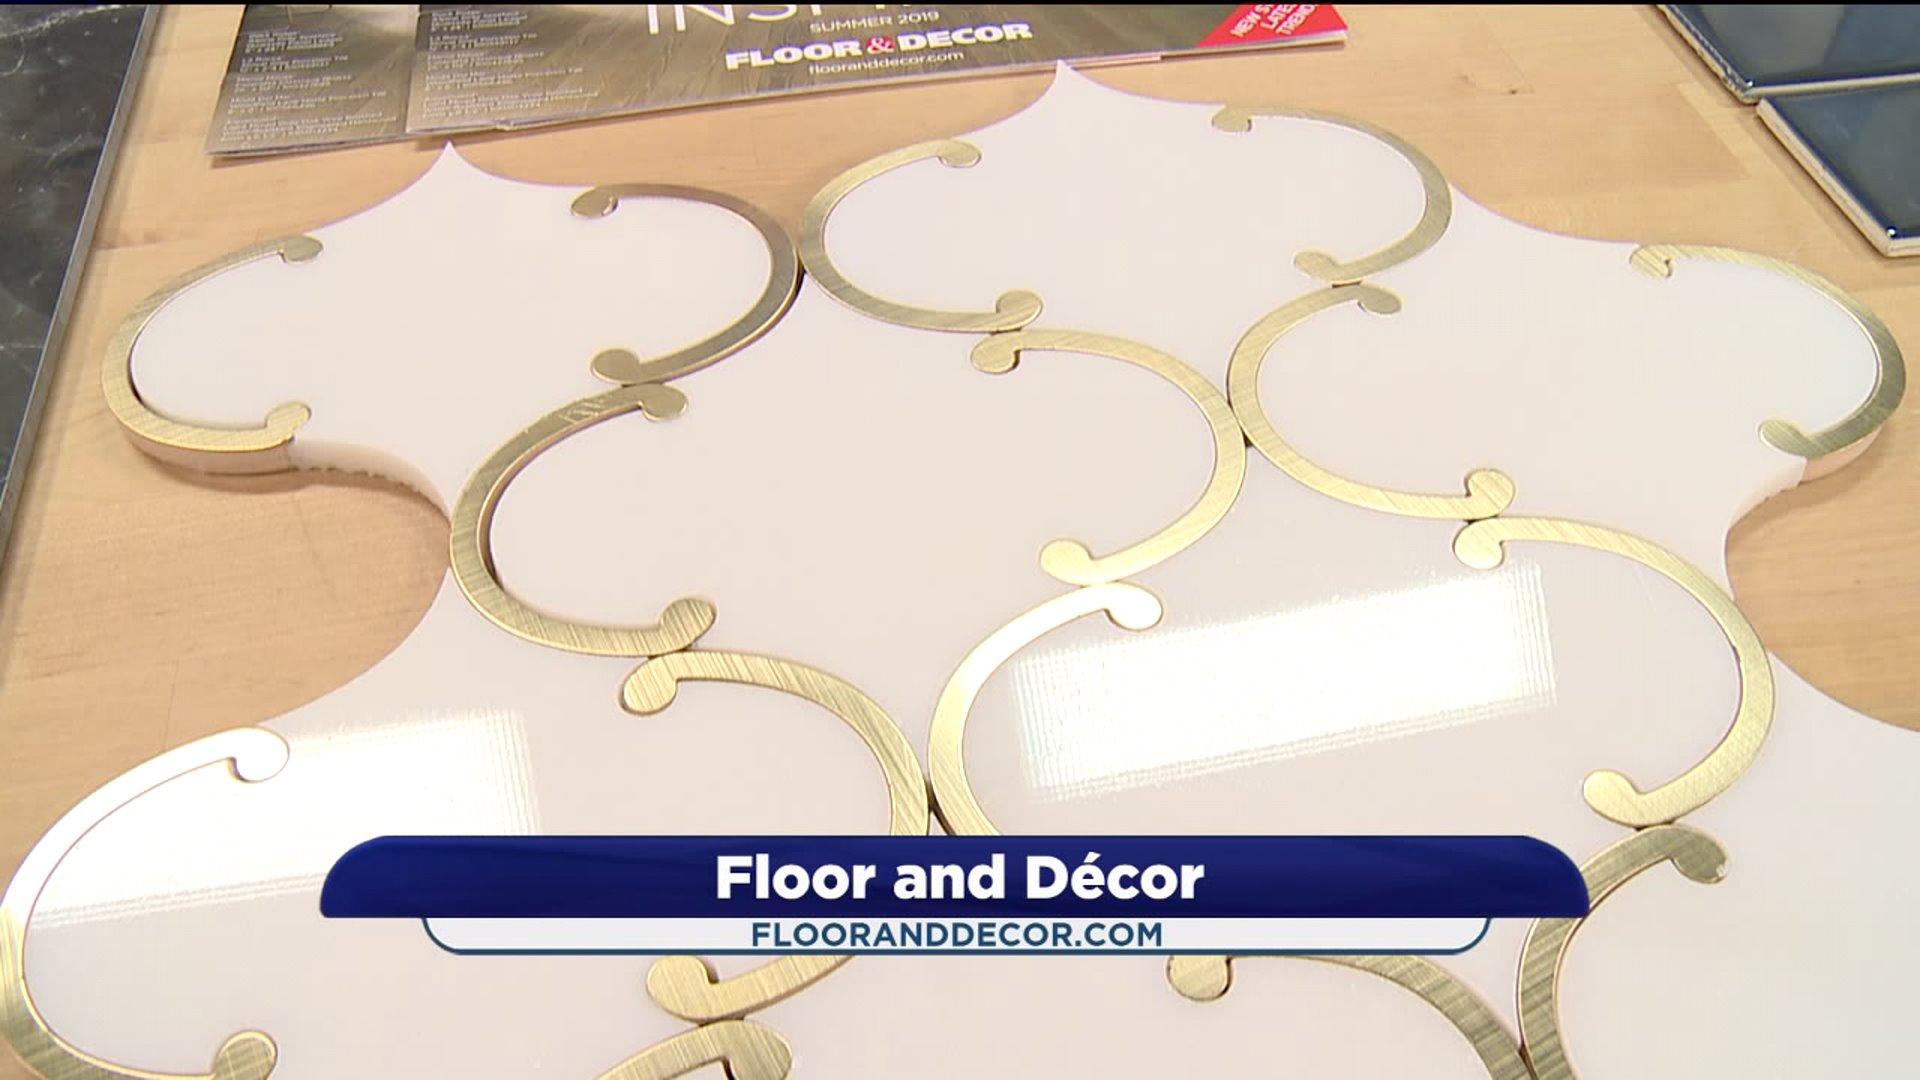 Floor and Decor | FOX31 Denver